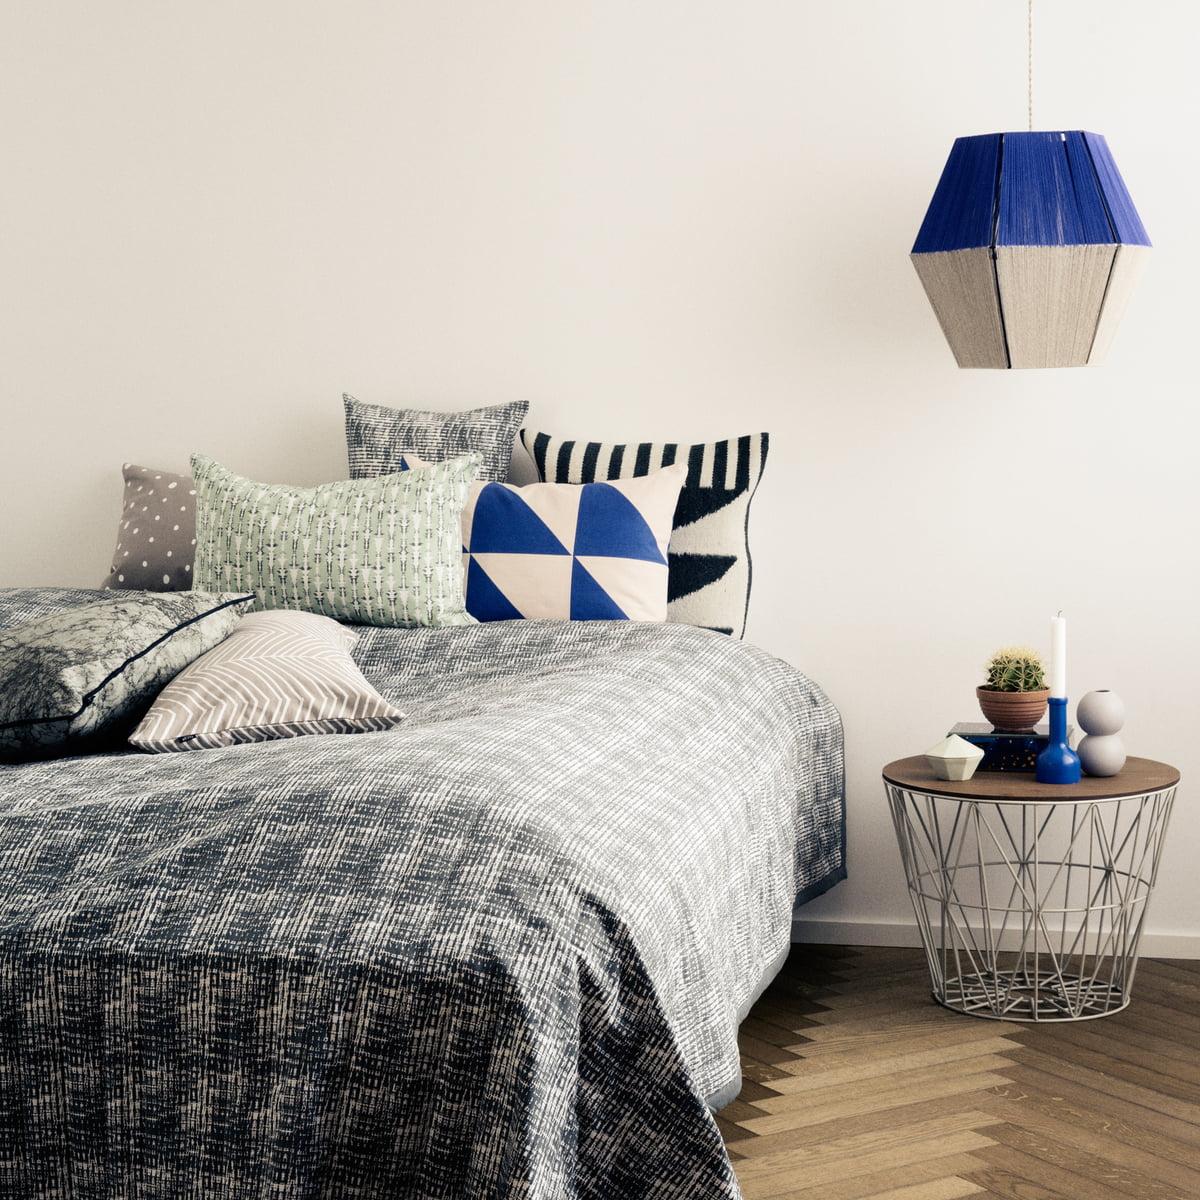 dotted kissen von ferm living. Black Bedroom Furniture Sets. Home Design Ideas